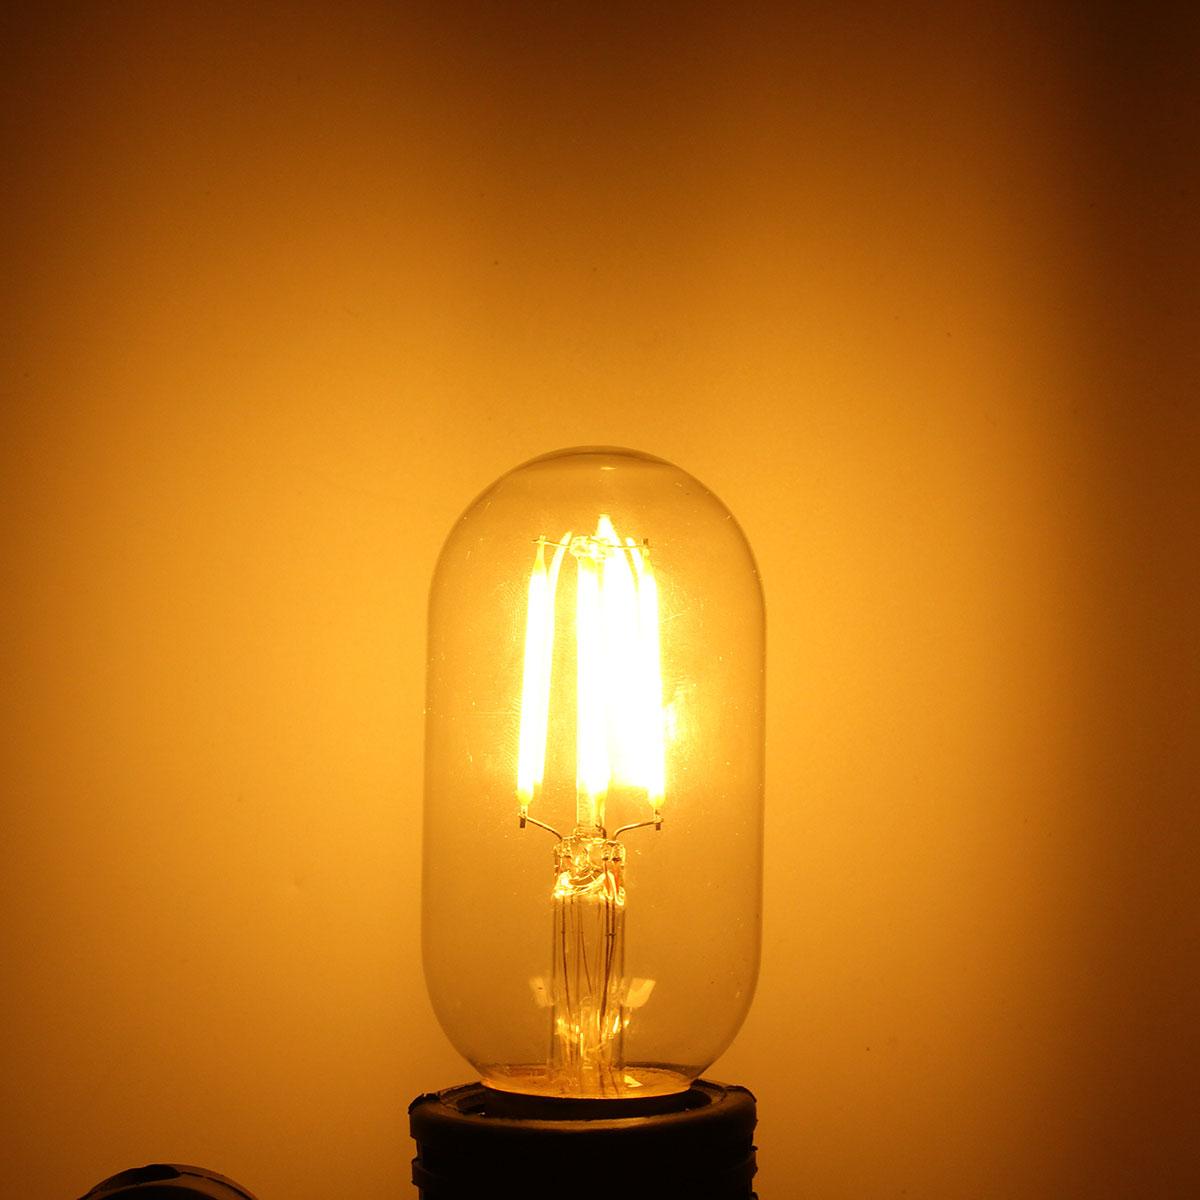 dimmable e27 e26 t45 4w warm white cob led filament retro edison led bulbs 110v 220v. Black Bedroom Furniture Sets. Home Design Ideas